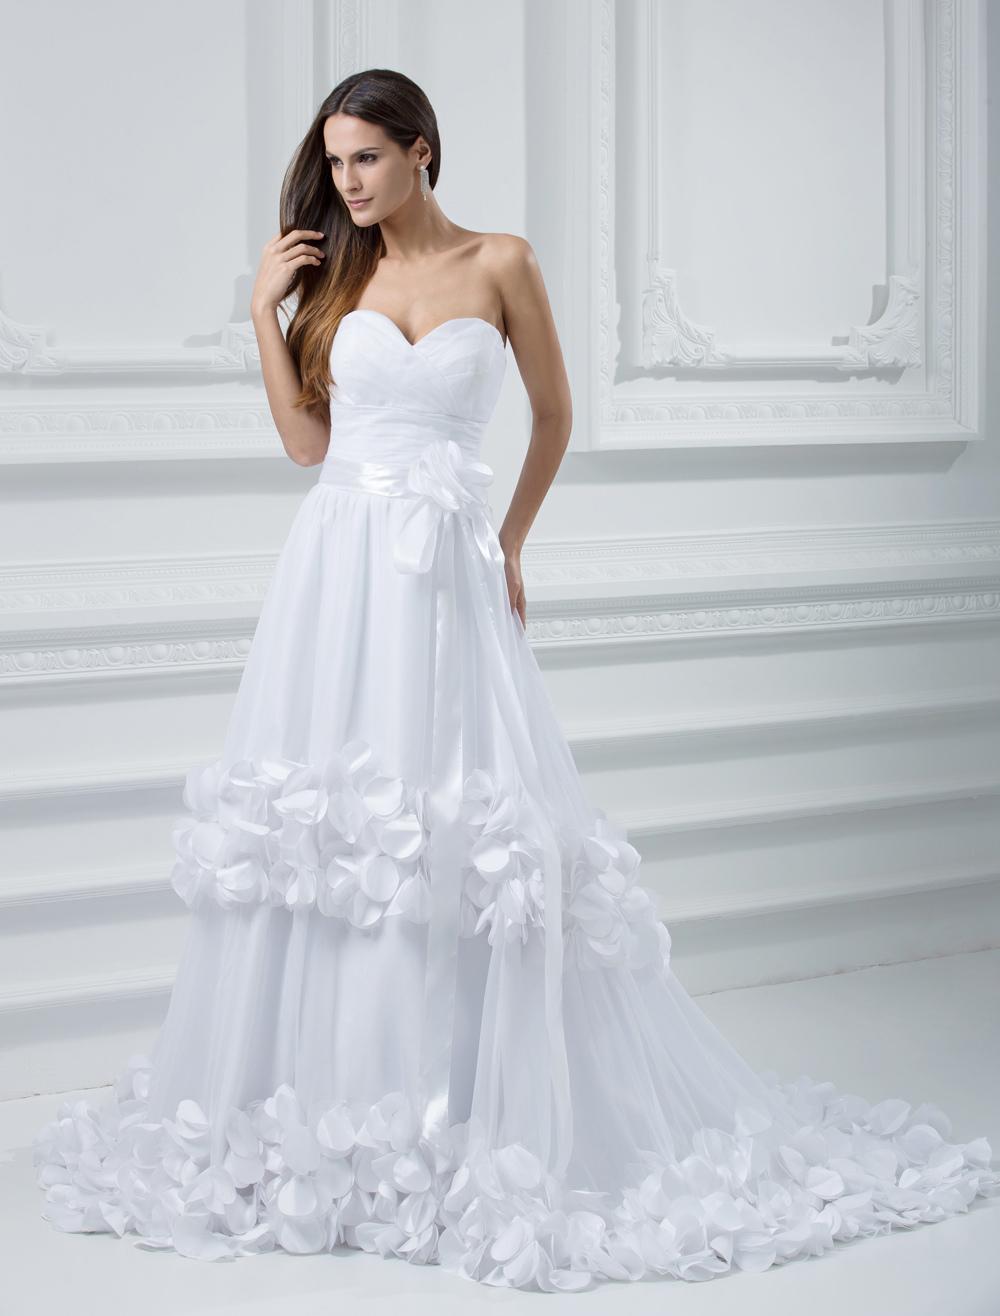 Romantic White Tulle A-line Sweetheart Celebrity Wedding Dresses